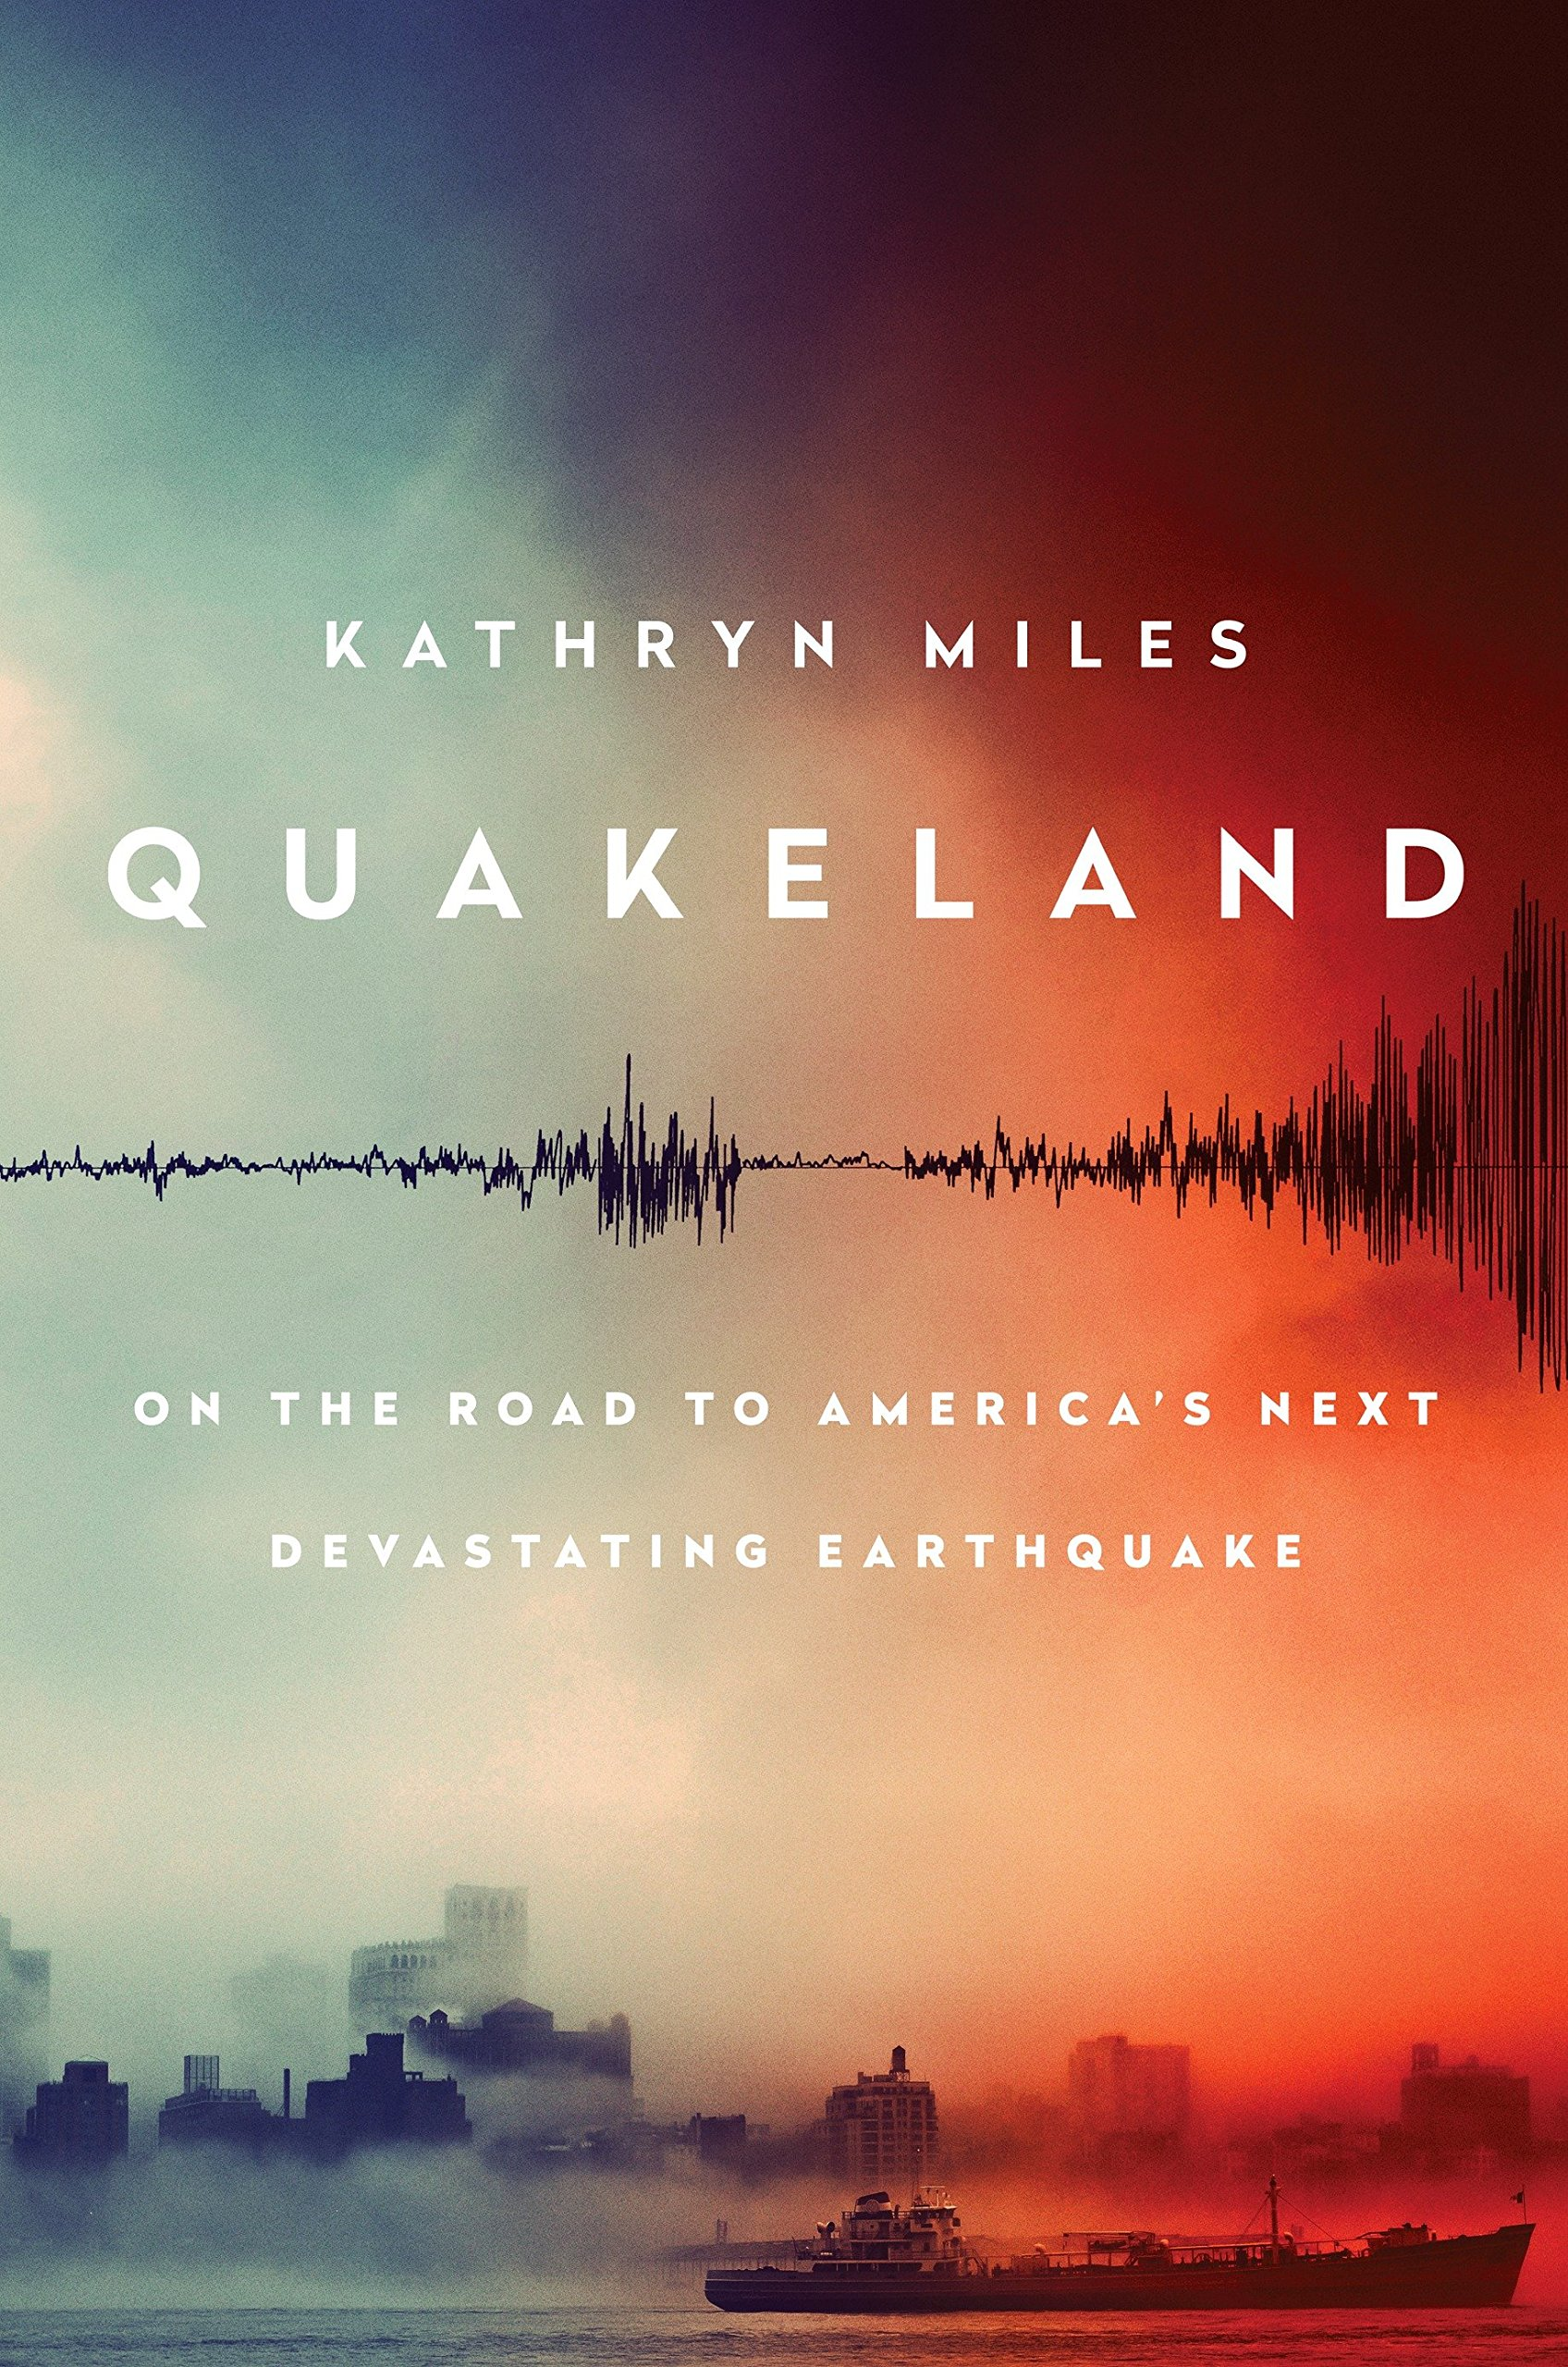 Quakeland On The Road To Americas Next Devastating Earthquake  Quakeland On The Road To Americas Next Devastating Earthquake Kathryn  Miles  Amazoncom Books